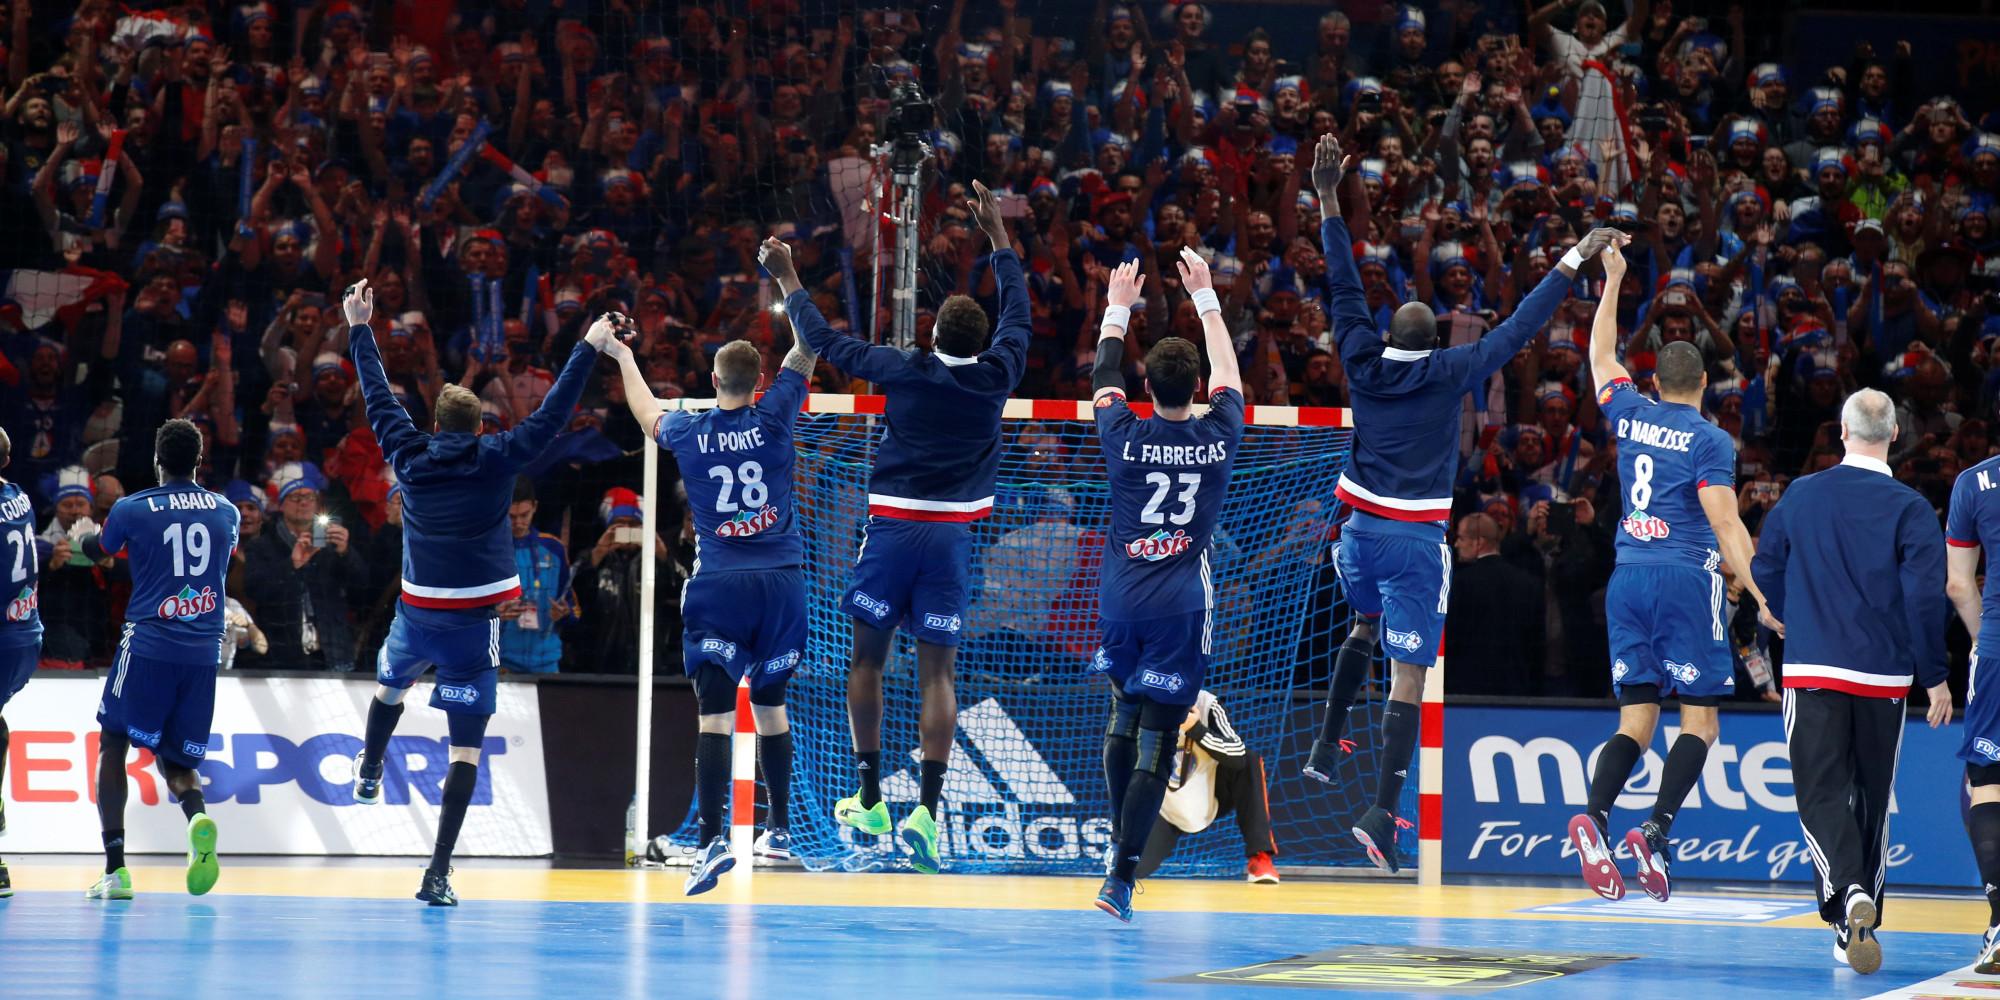 handball wm finale stream